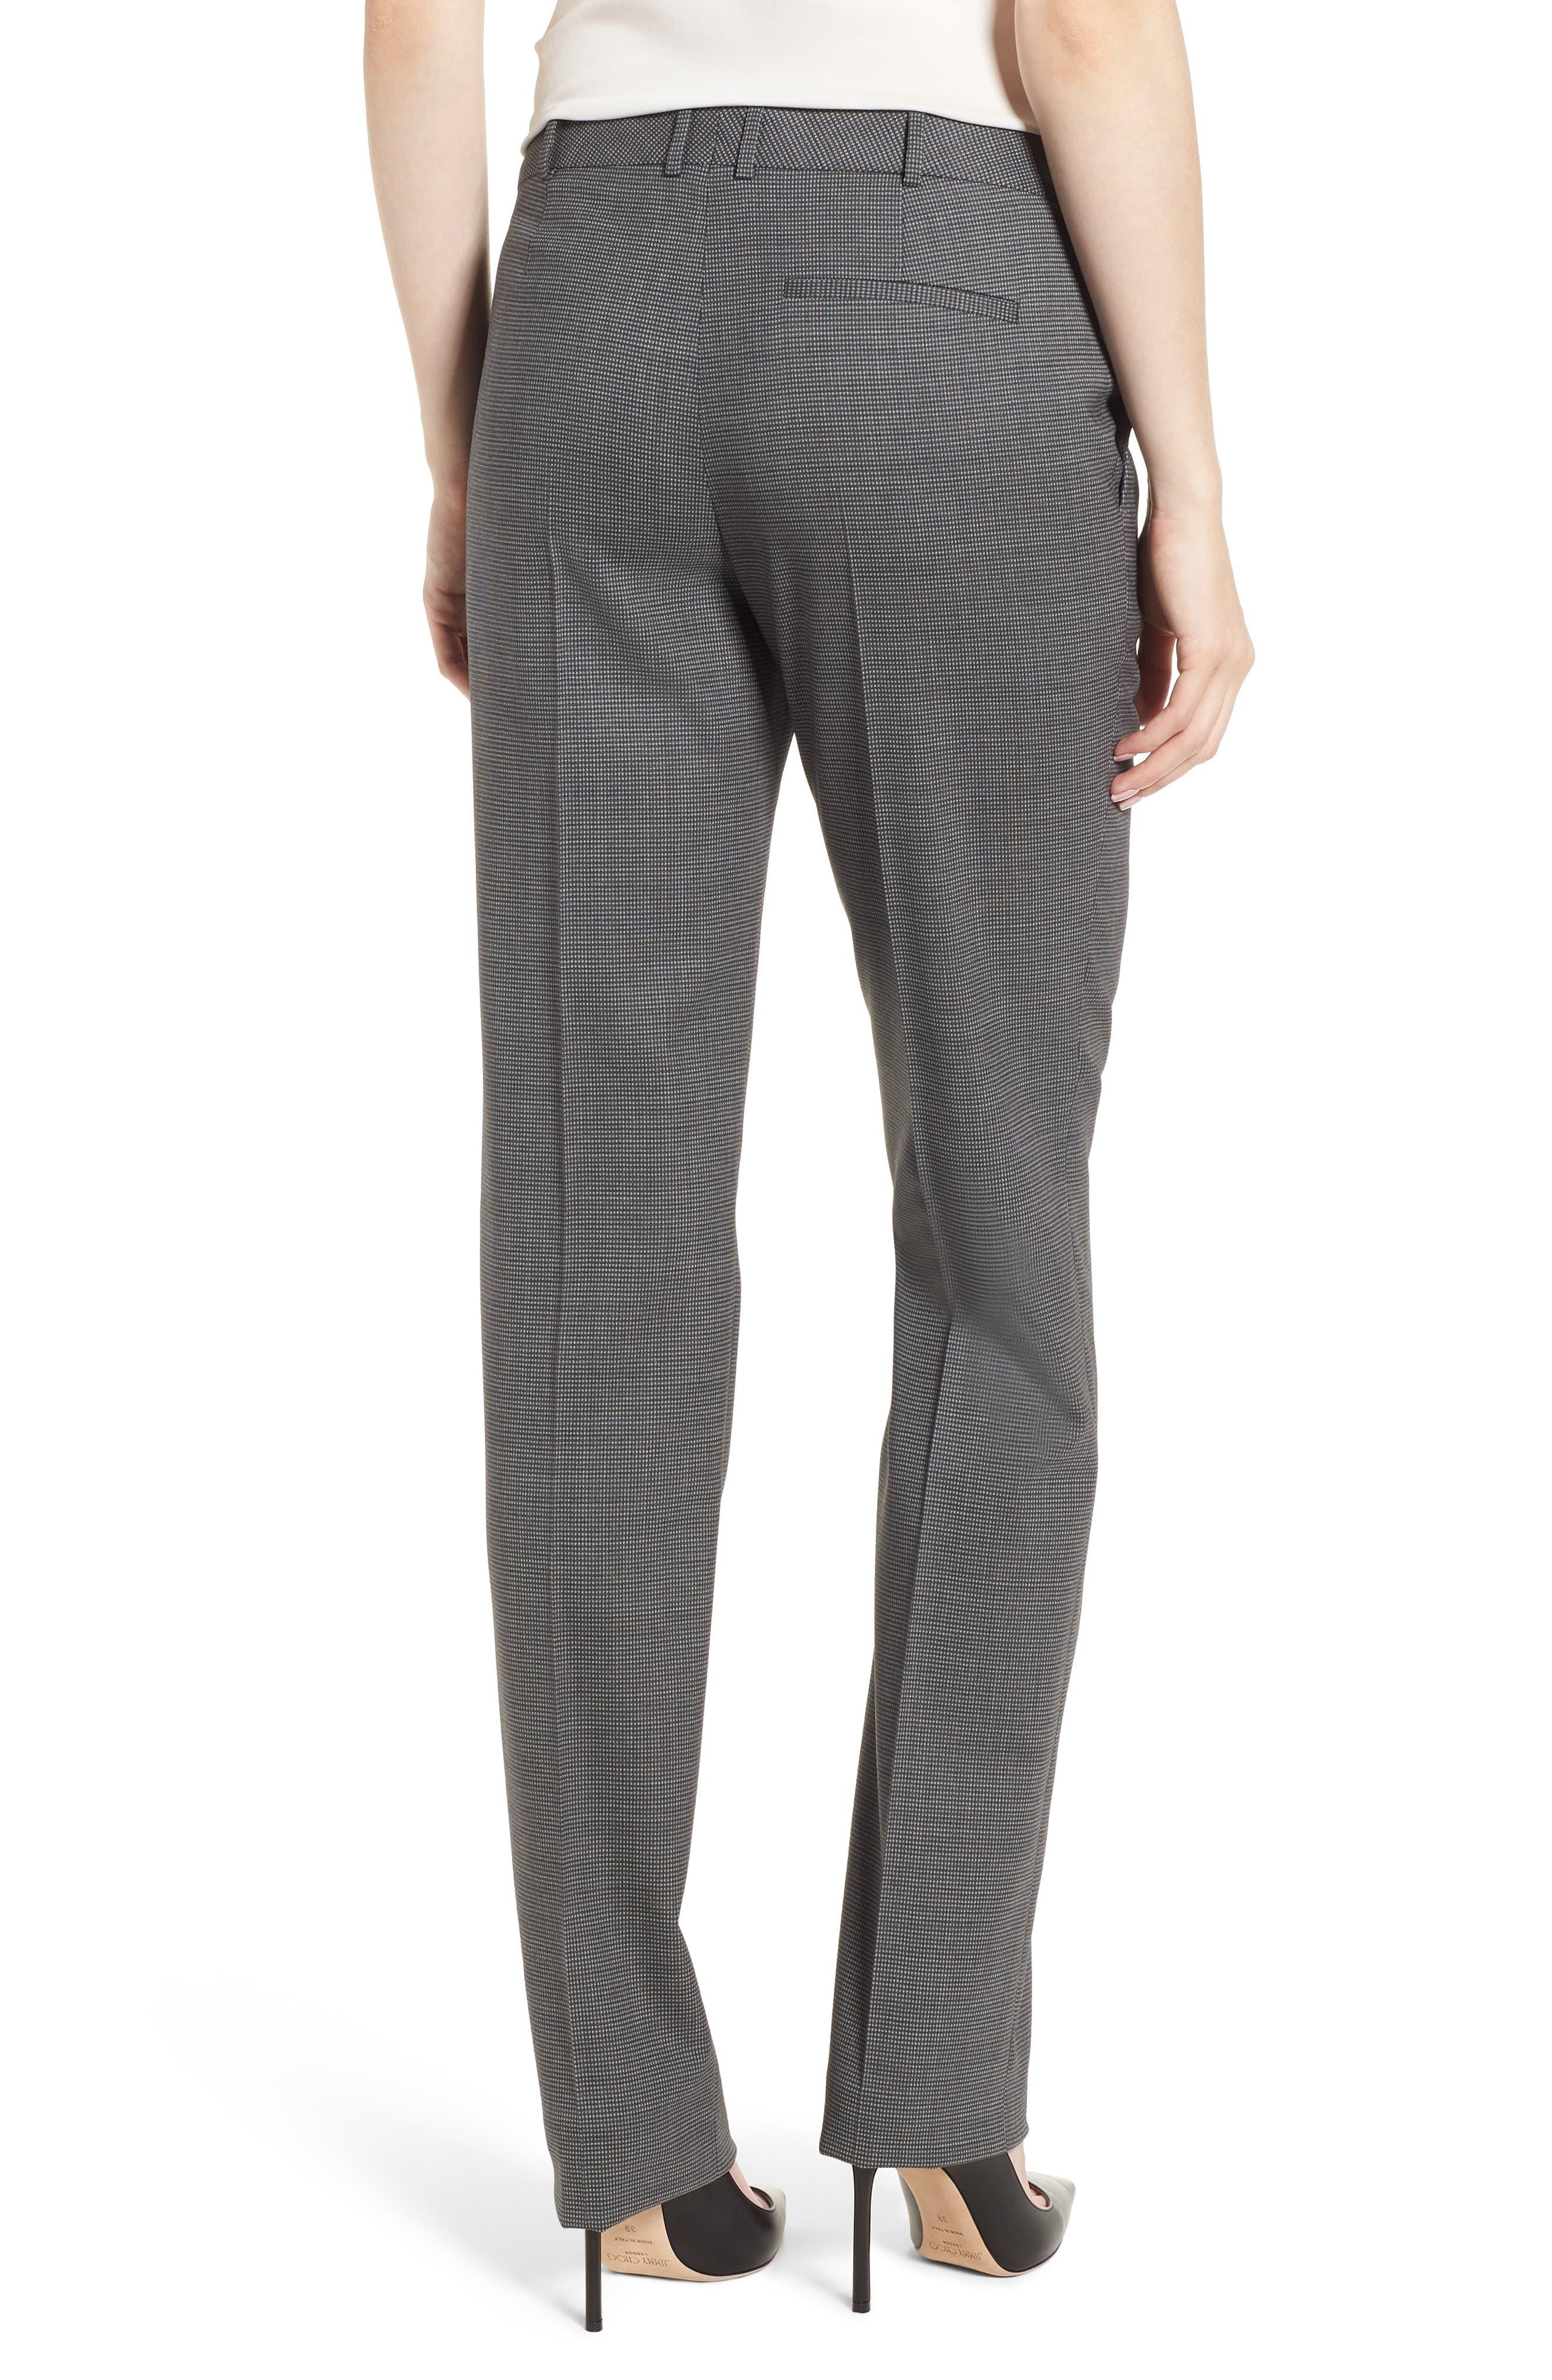 Tamea Minidessin Trousers,                             Alternate thumbnail 2, color,                             072